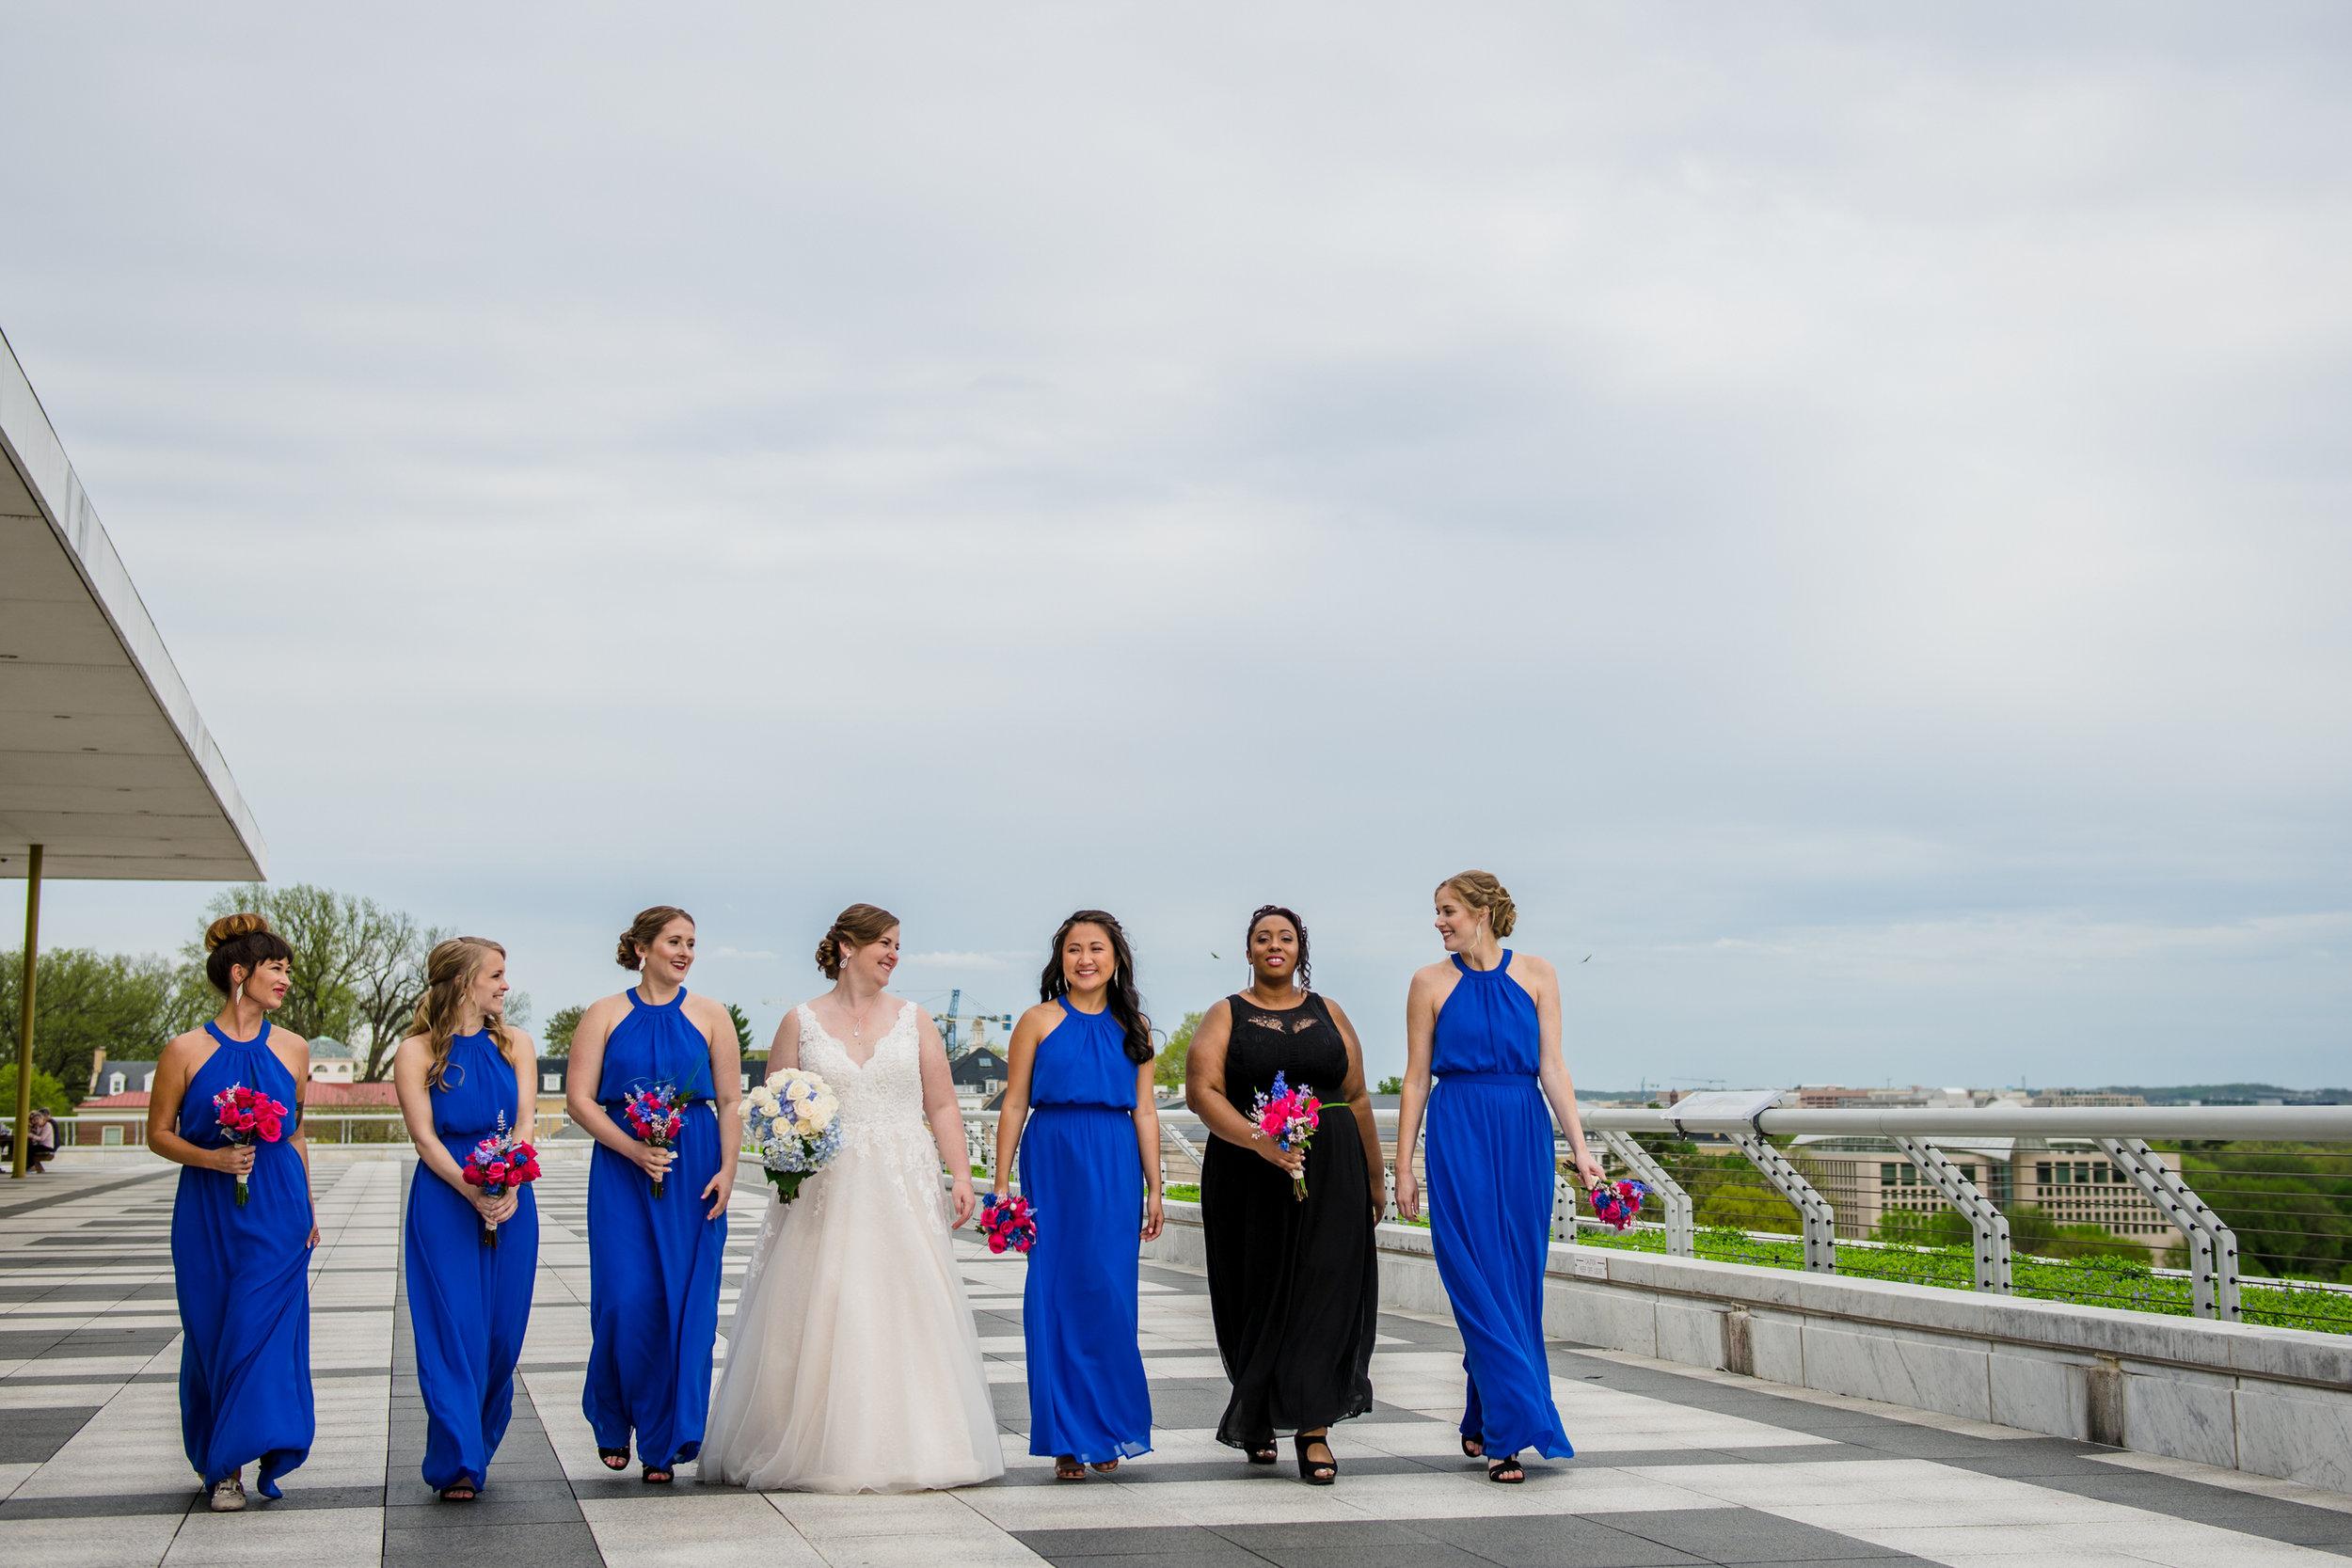 MarriottDC-Sarah&Sasha-WeddingParty-9932.jpg